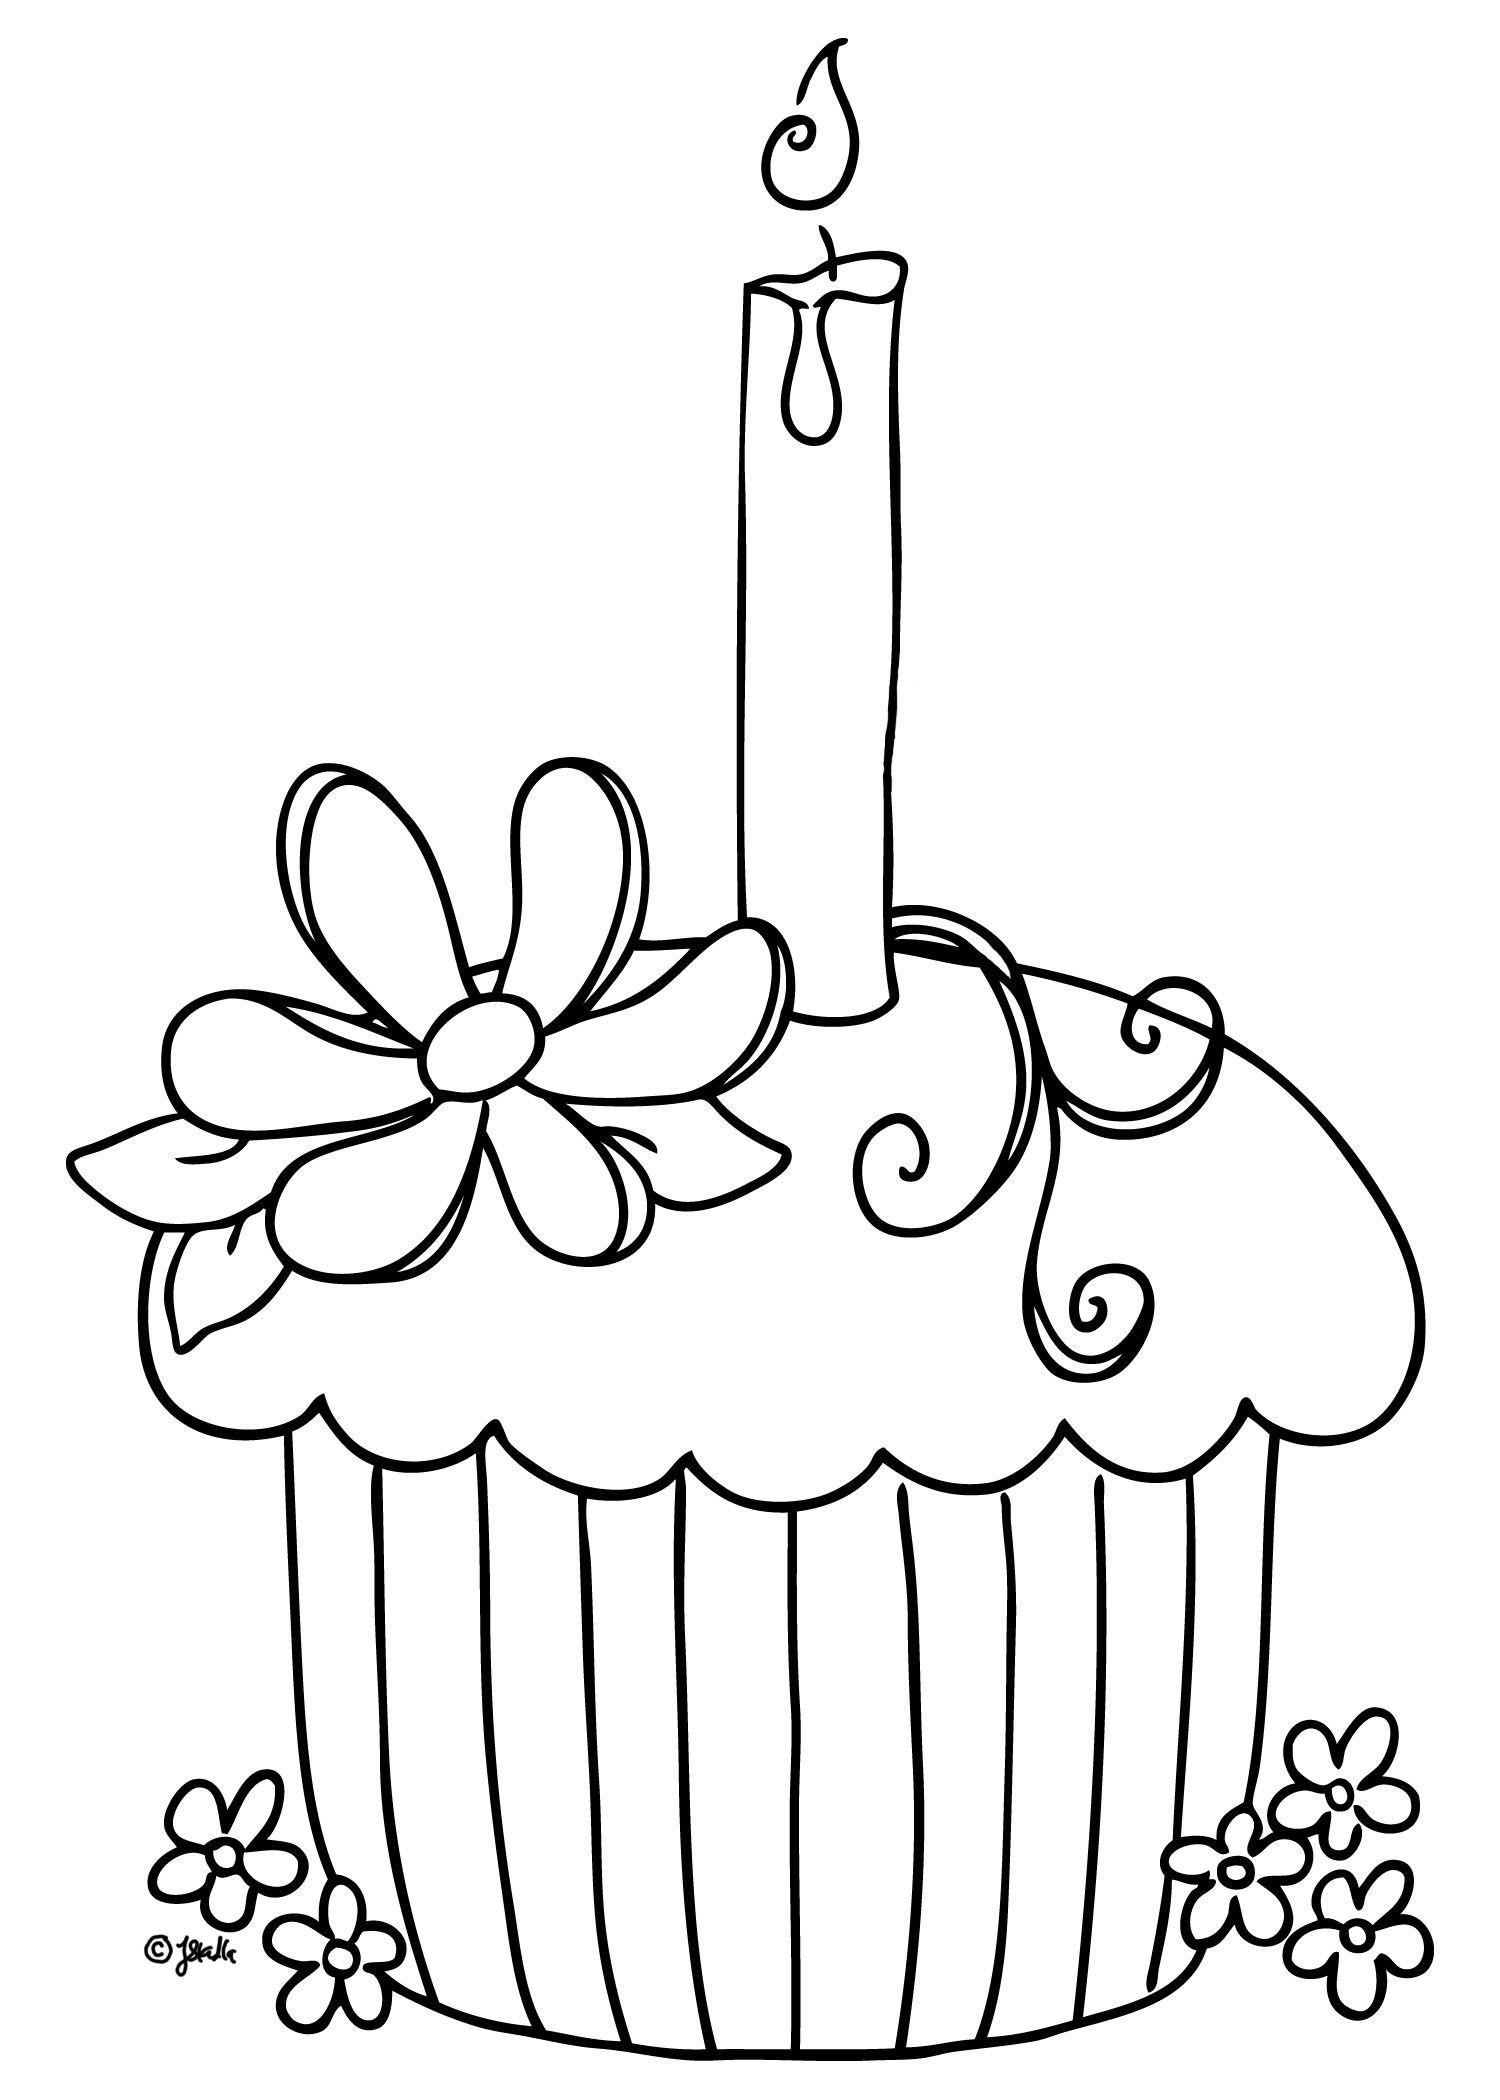 Cupcake Zum Ausmalen Genial Petkins Royal Cupcake Shopkin Coloring Page Schön Ausmalbilder Galerie